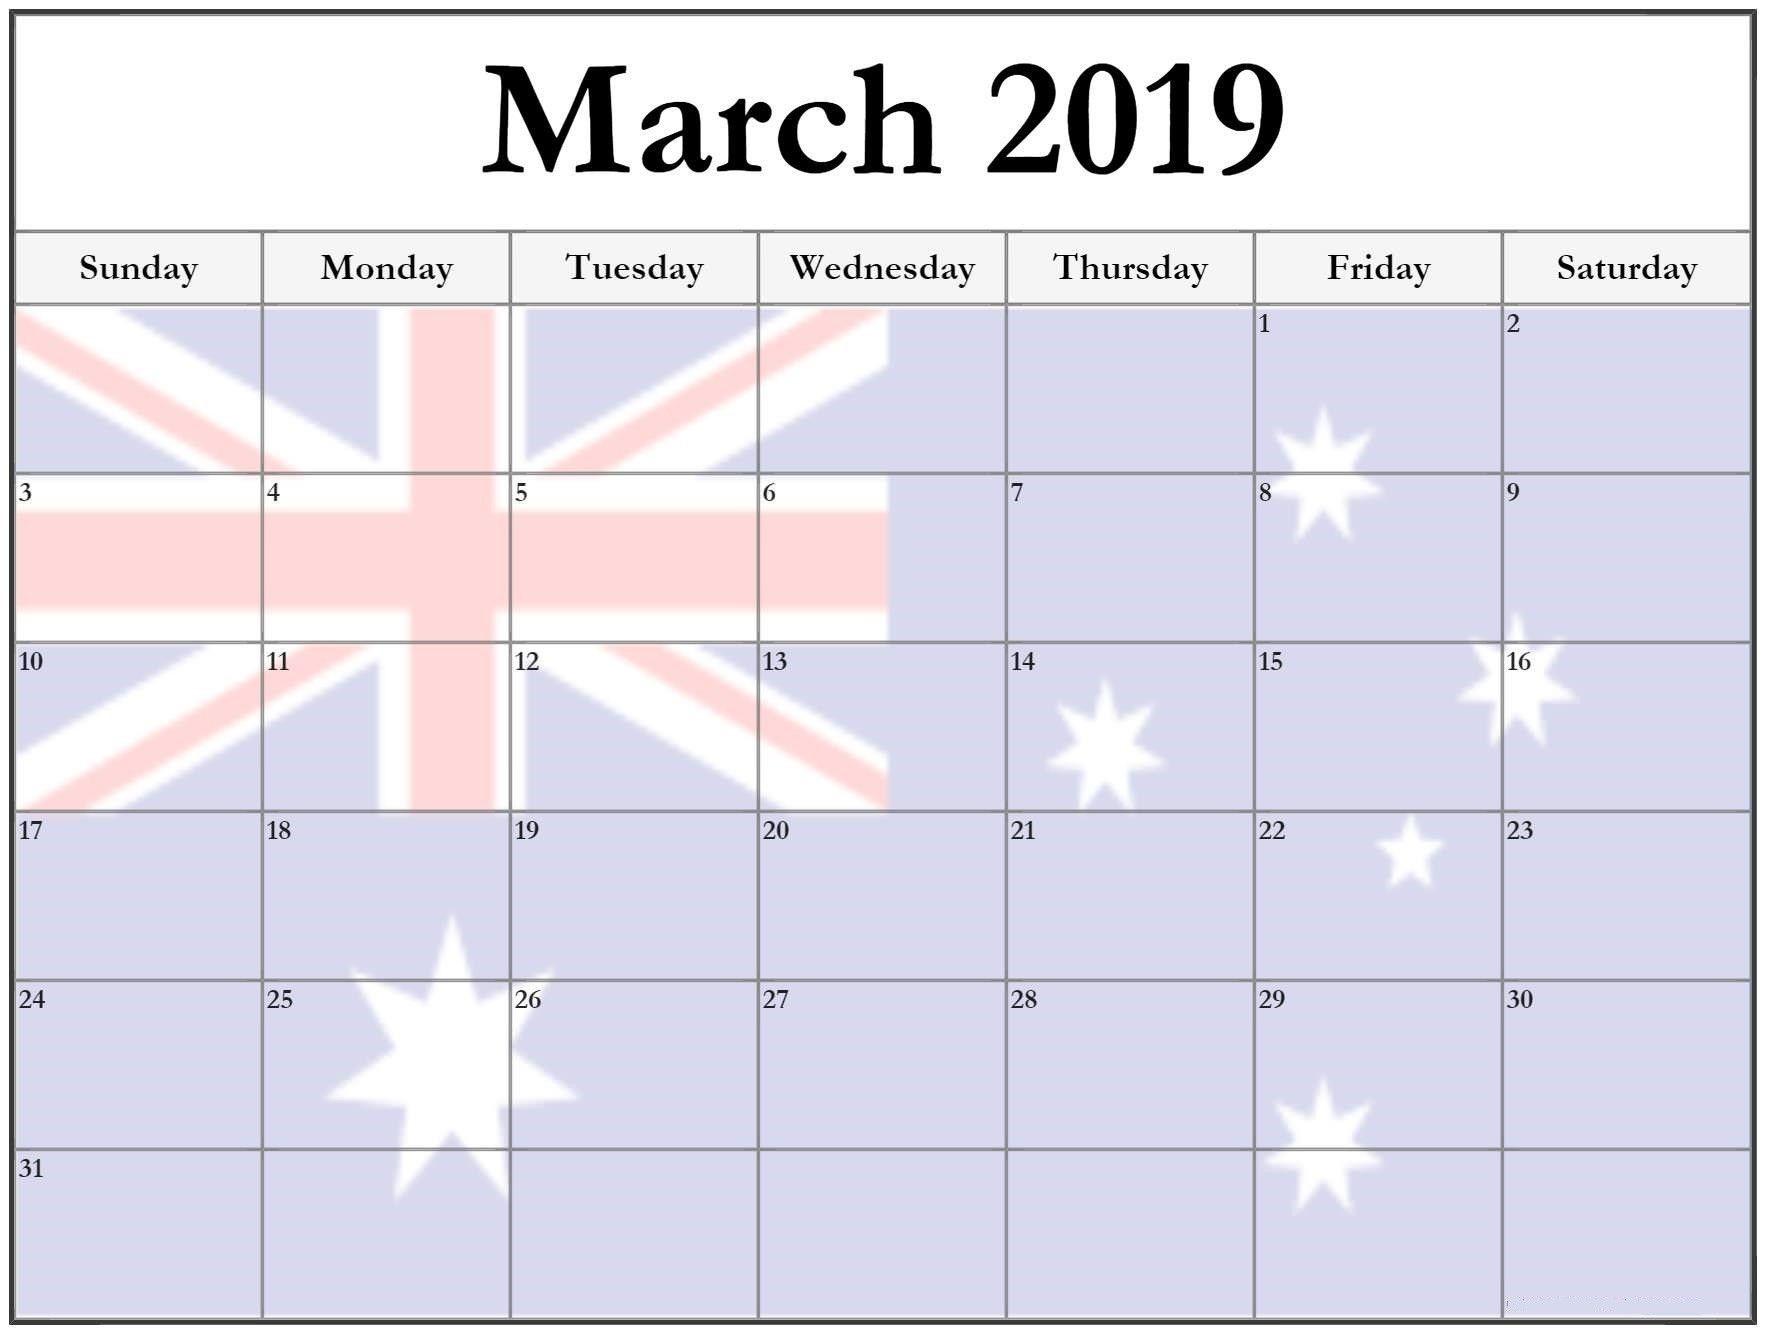 March 2019 Calendar With Holidays Australia MarchCalendar March2019Calendar CalendarMarch2019 MarchCalendarPrintable 2019MarchCalendar